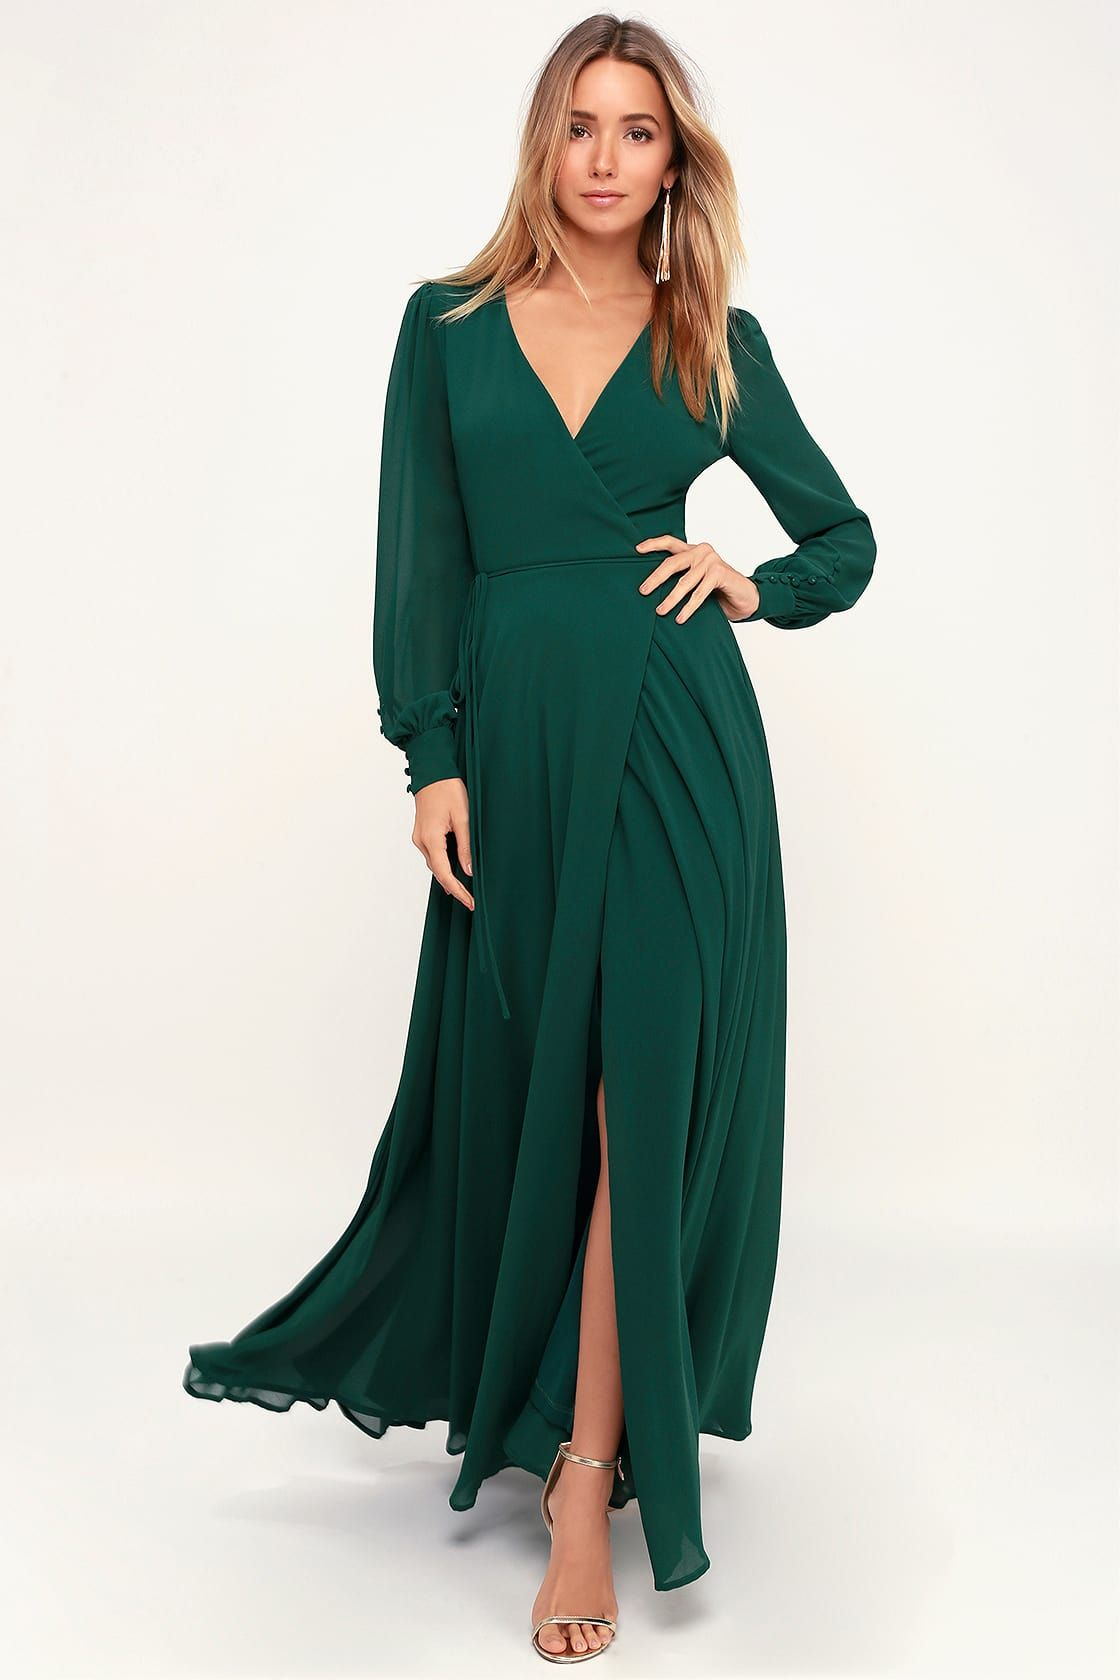 My Whole Heart Emerald Green Long Sleeve Wrap Dress Long Sleeve Bridesmaid Dress Wrap Dress Dress To Hide Belly [ 1680 x 1120 Pixel ]